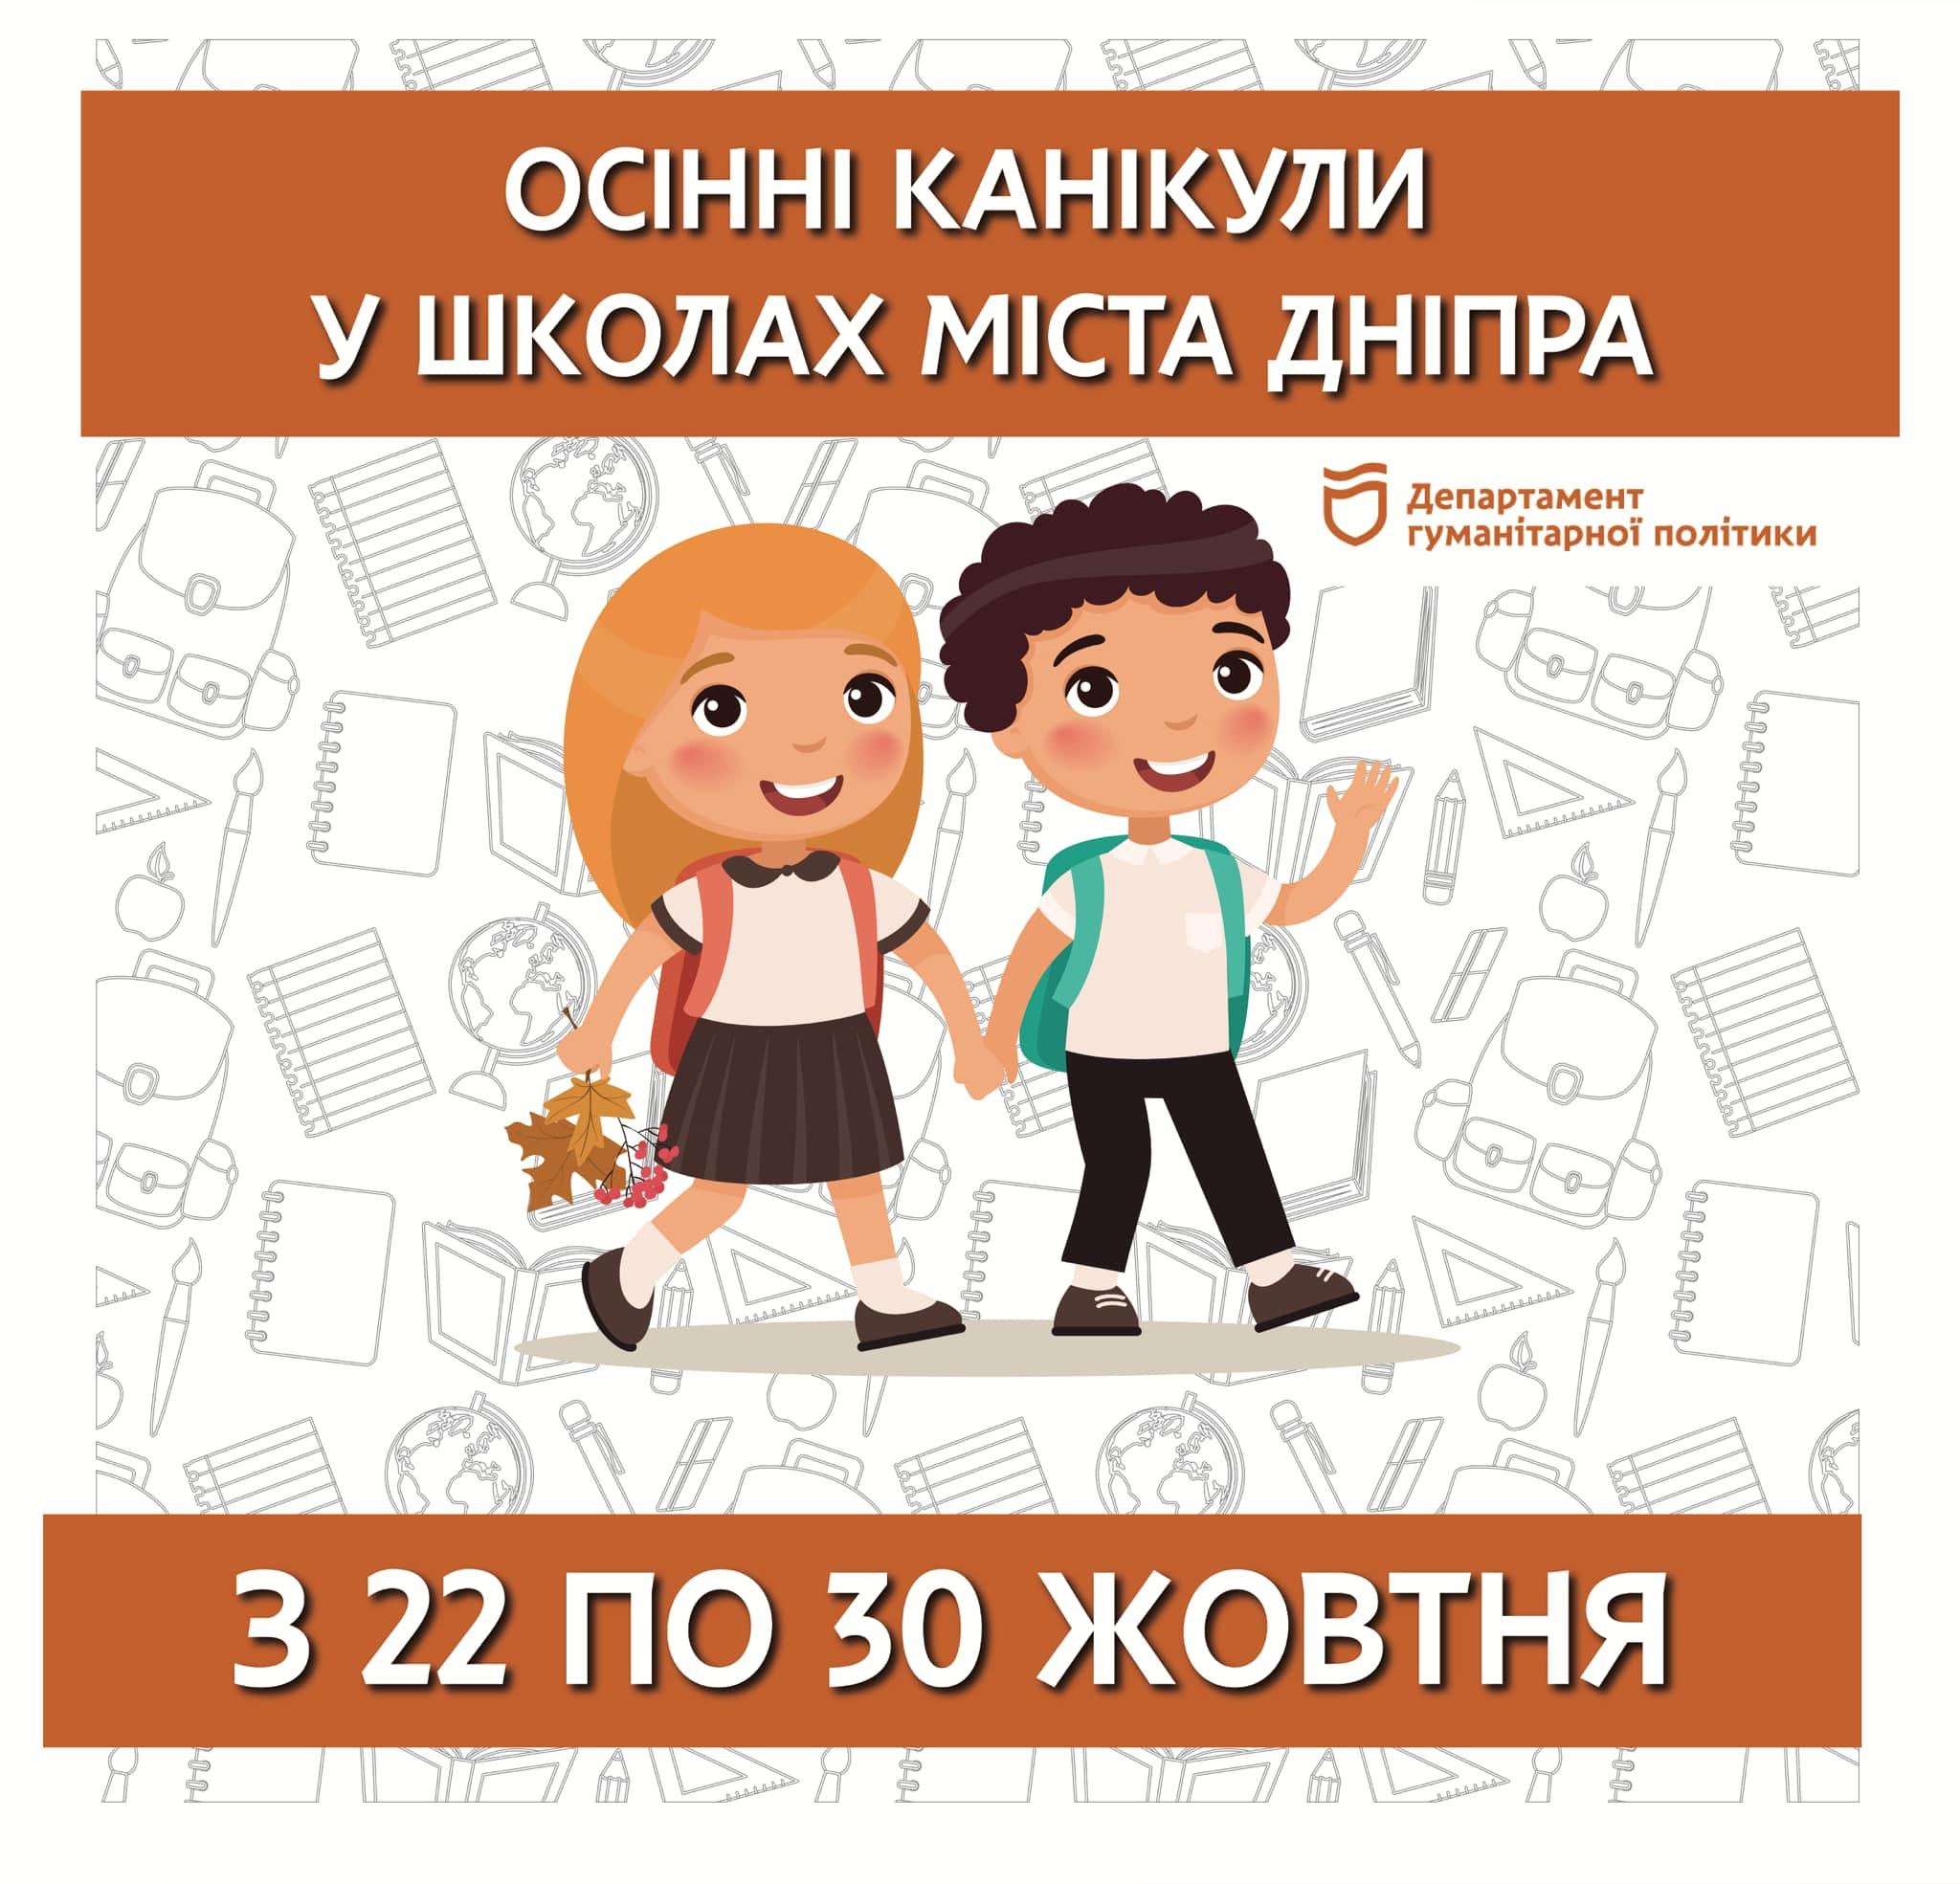 Мама готовься: когда школы Днепра уйдут на каникулы - Днепр Vgorode.ua